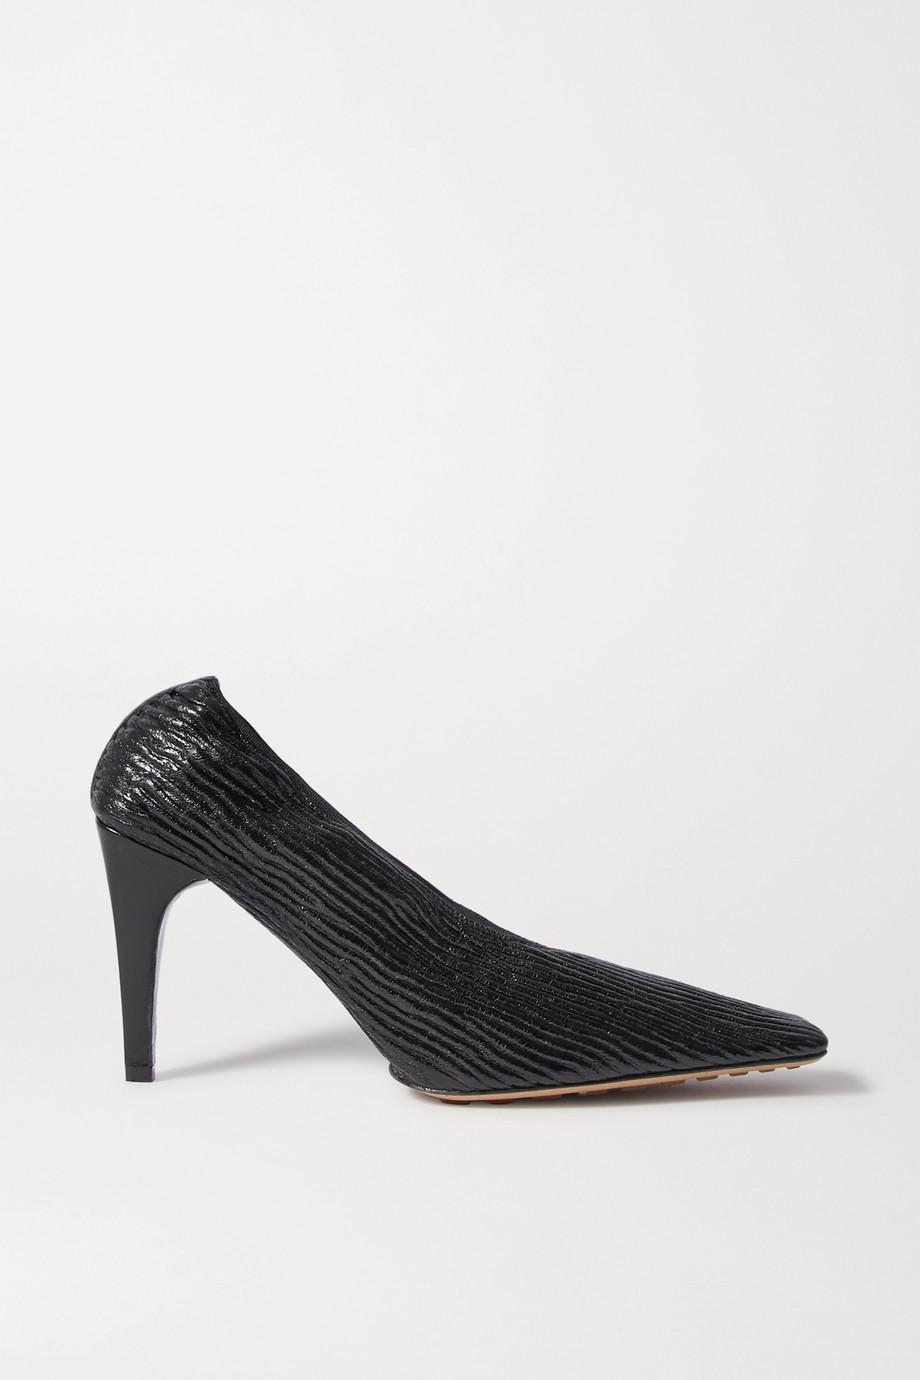 Bottega Veneta 纹理亮面皮革高跟鞋